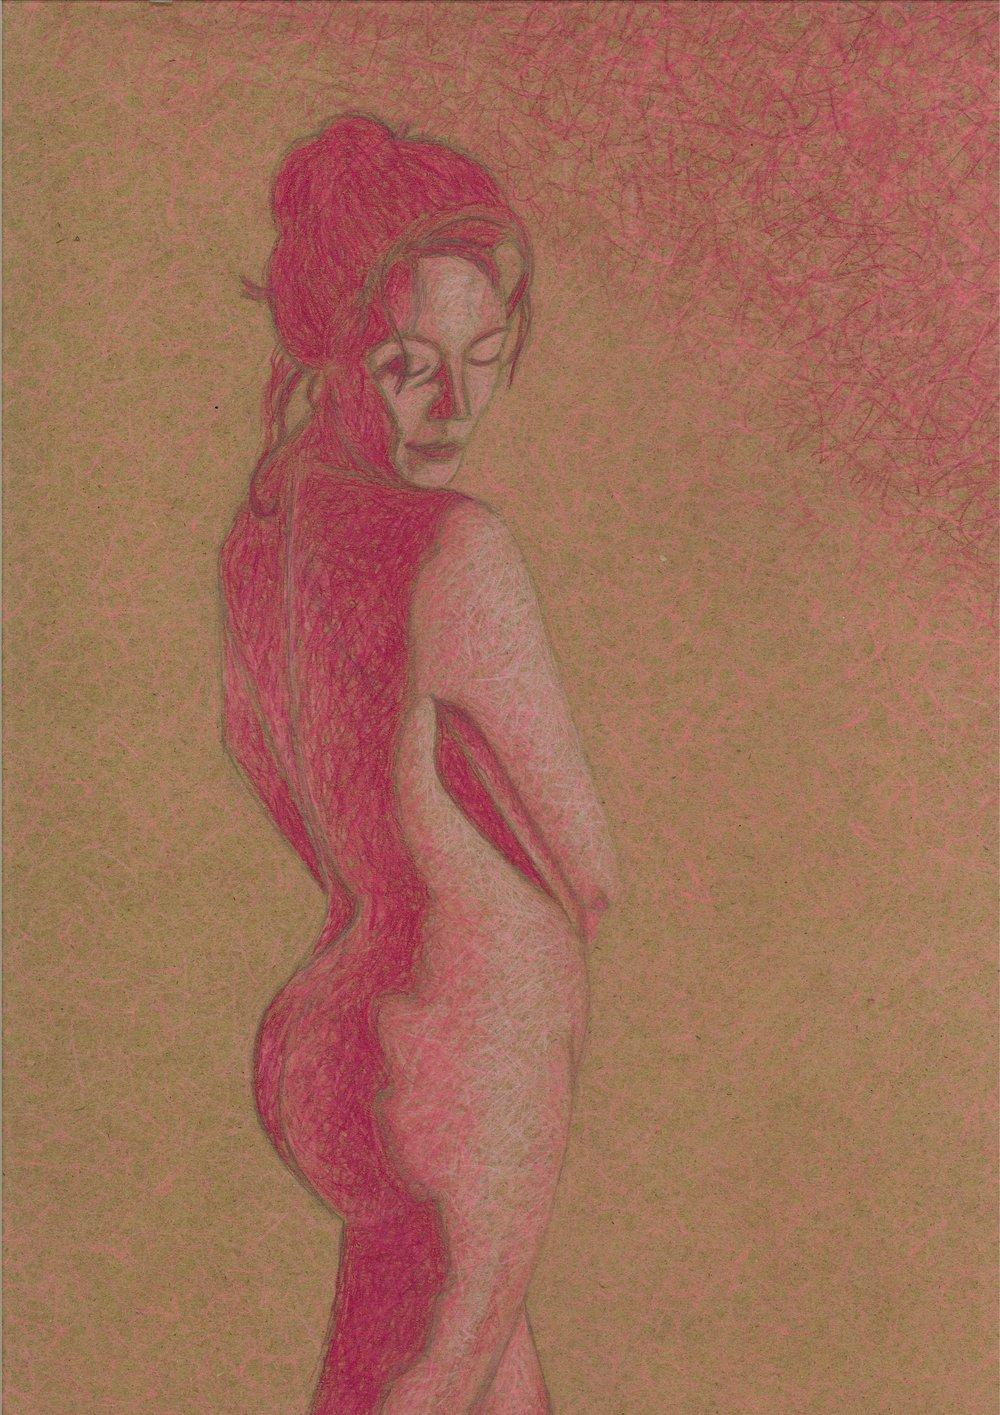 Image: Sheena Hanrahan,  Demi Goddess , 2018, pencil on paper